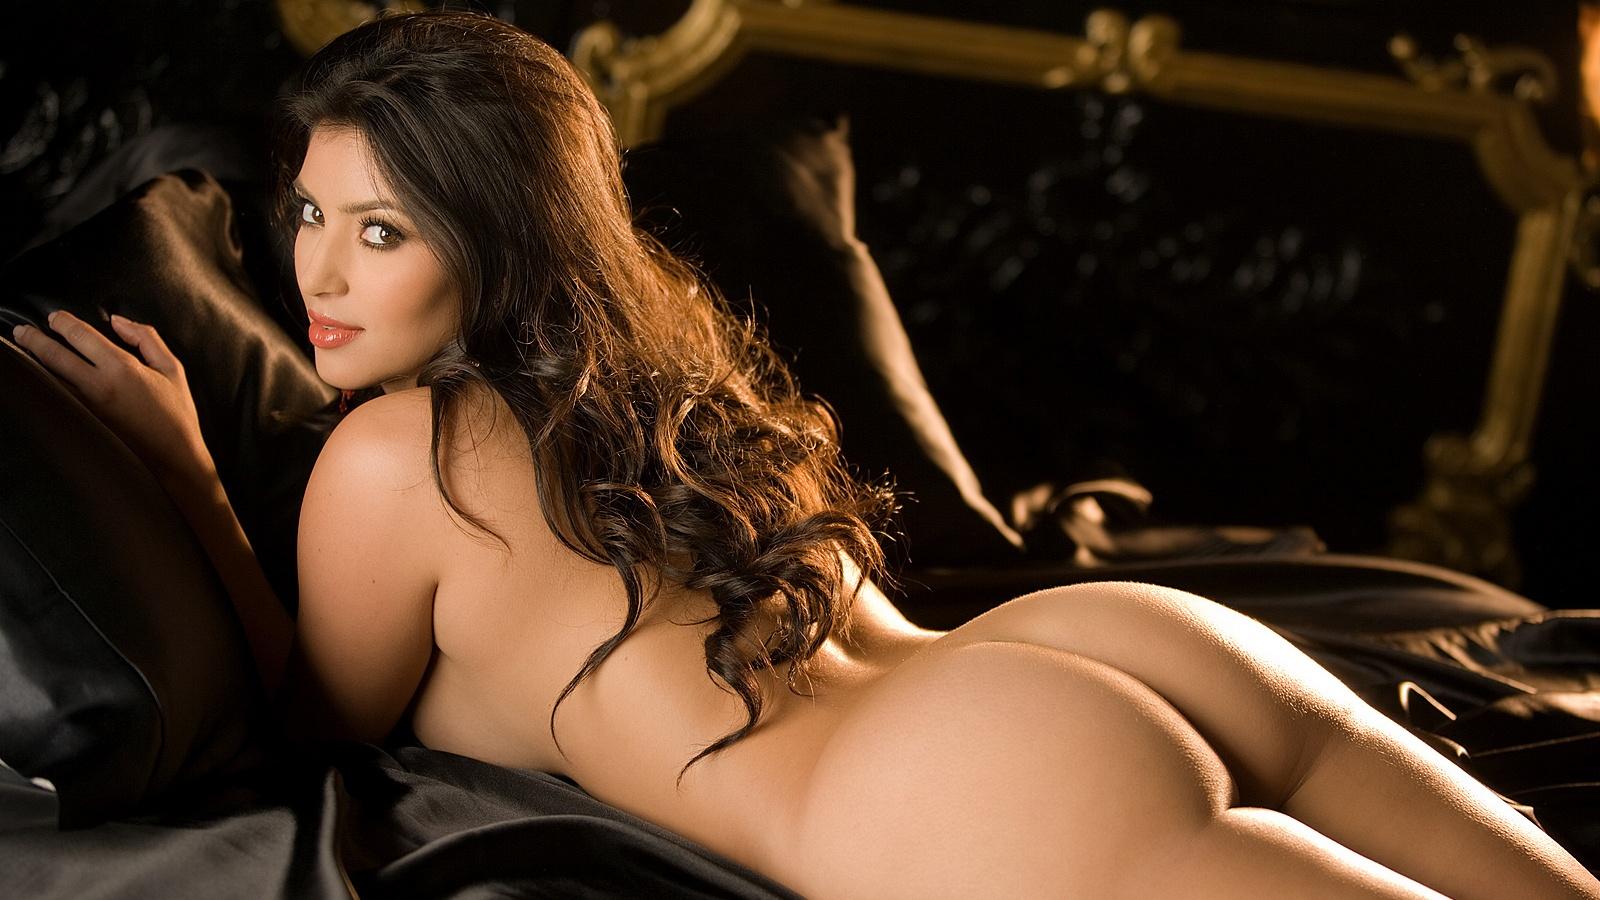 Nude kim kardashian look alike pornstar accept. The